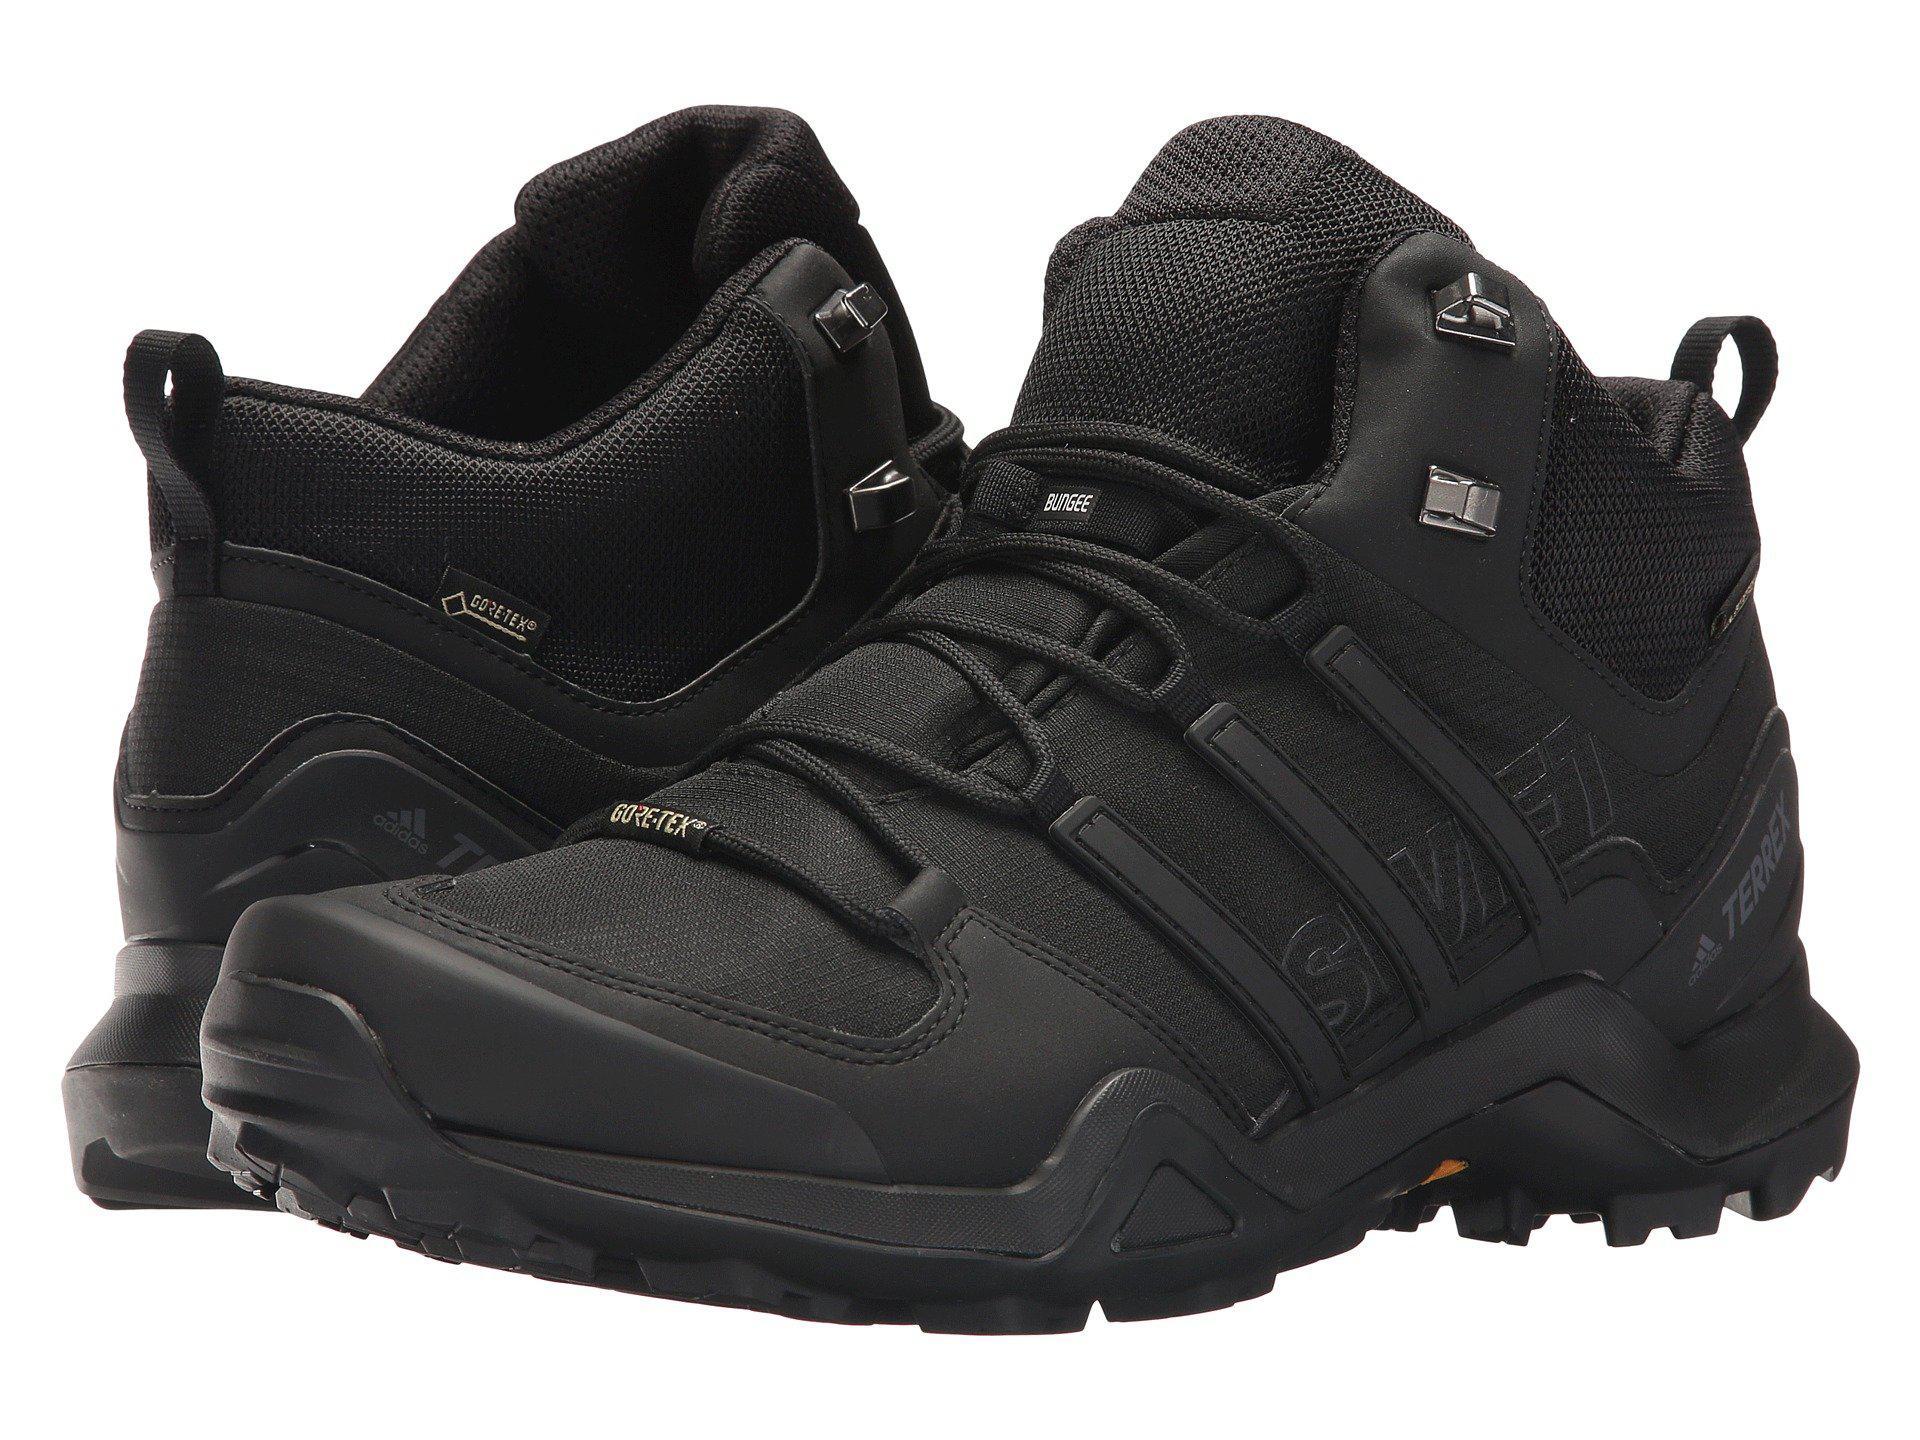 adidas men 's terrex swift r2 mid gtx cross trainers core black